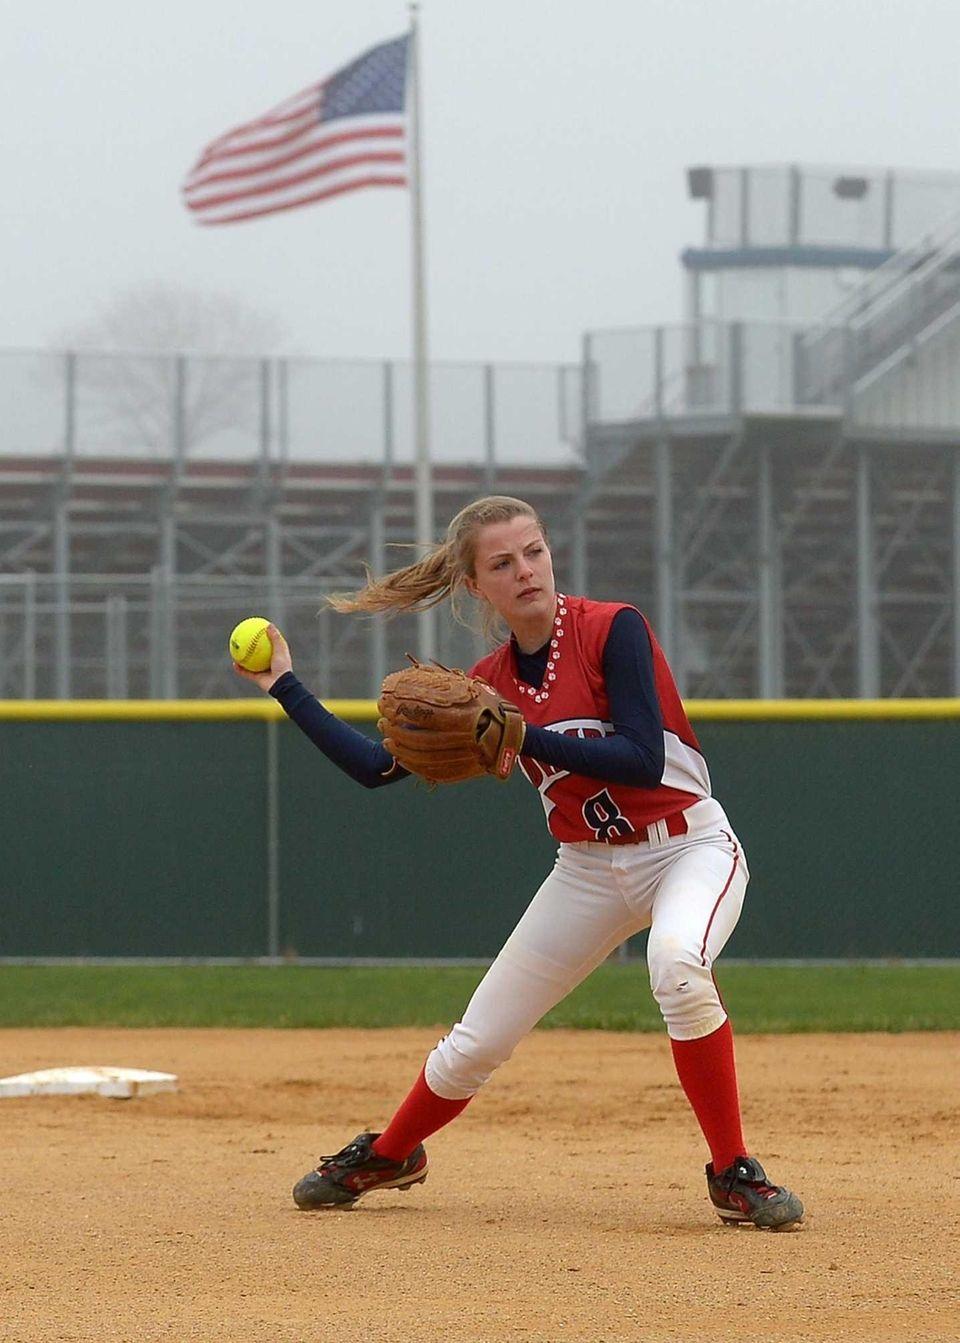 St. John the Baptist's second baseman Cara Bevilacqua